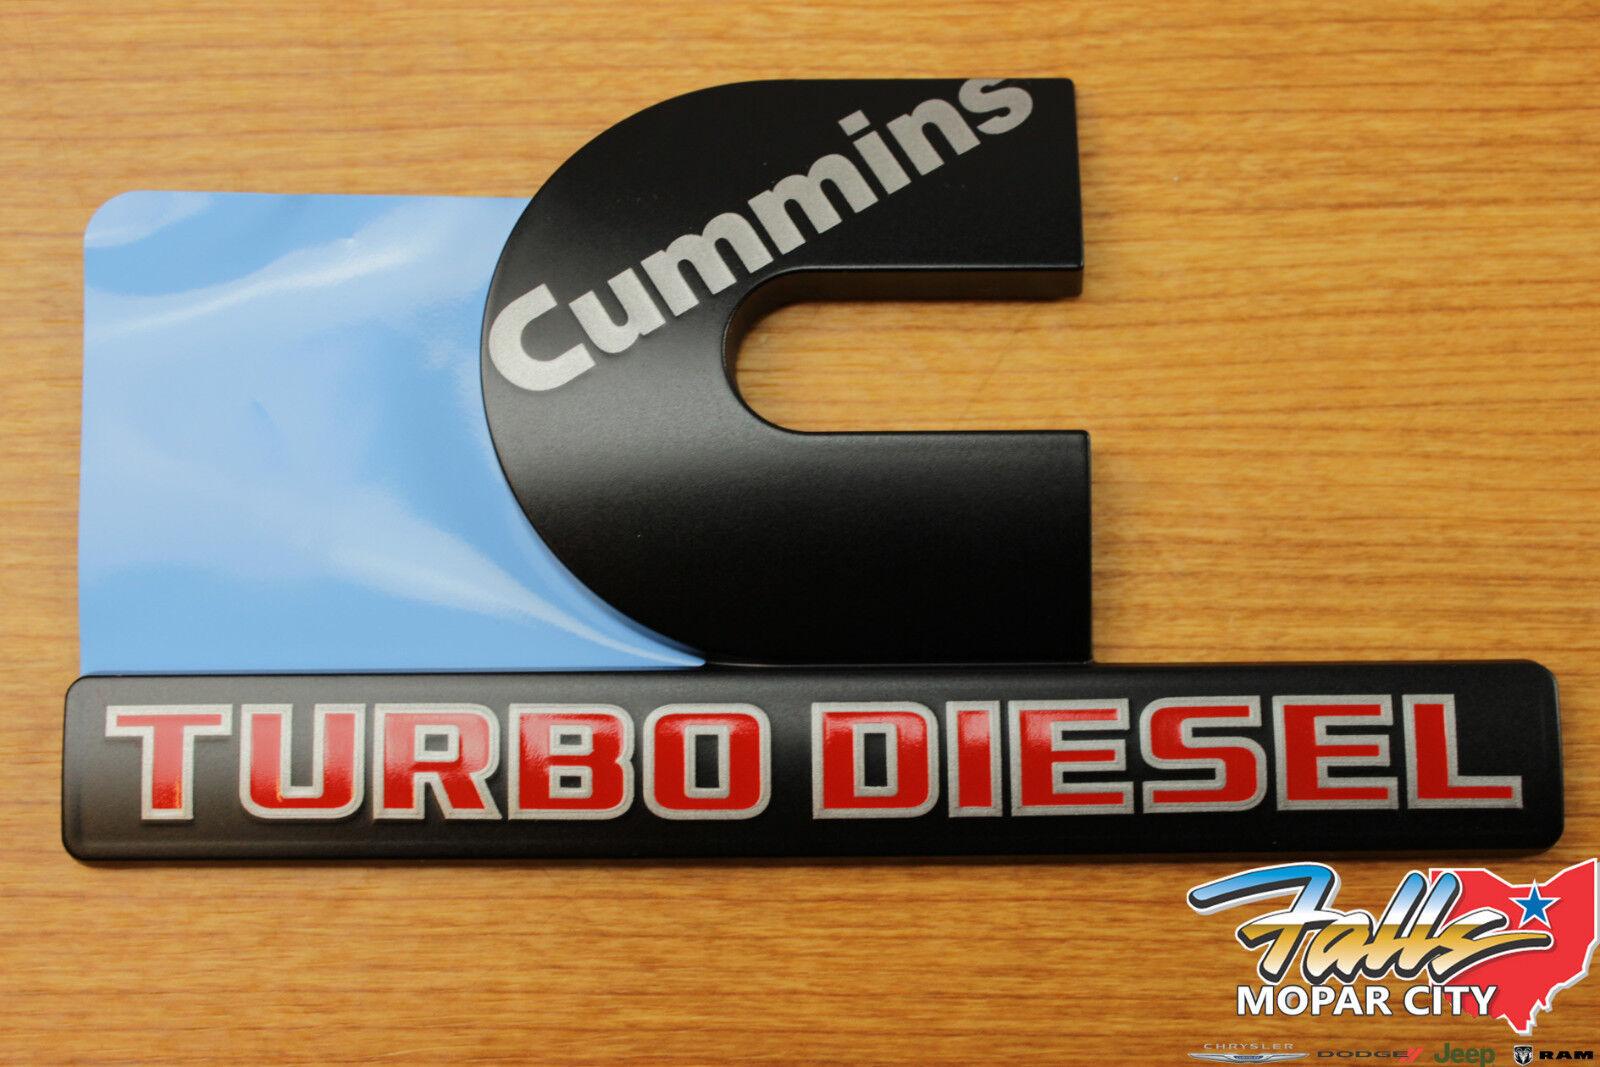 2X Cummins Turbo Diesel Decal Nameplate Emblem Chrome For Dodge Ram 2500 3500